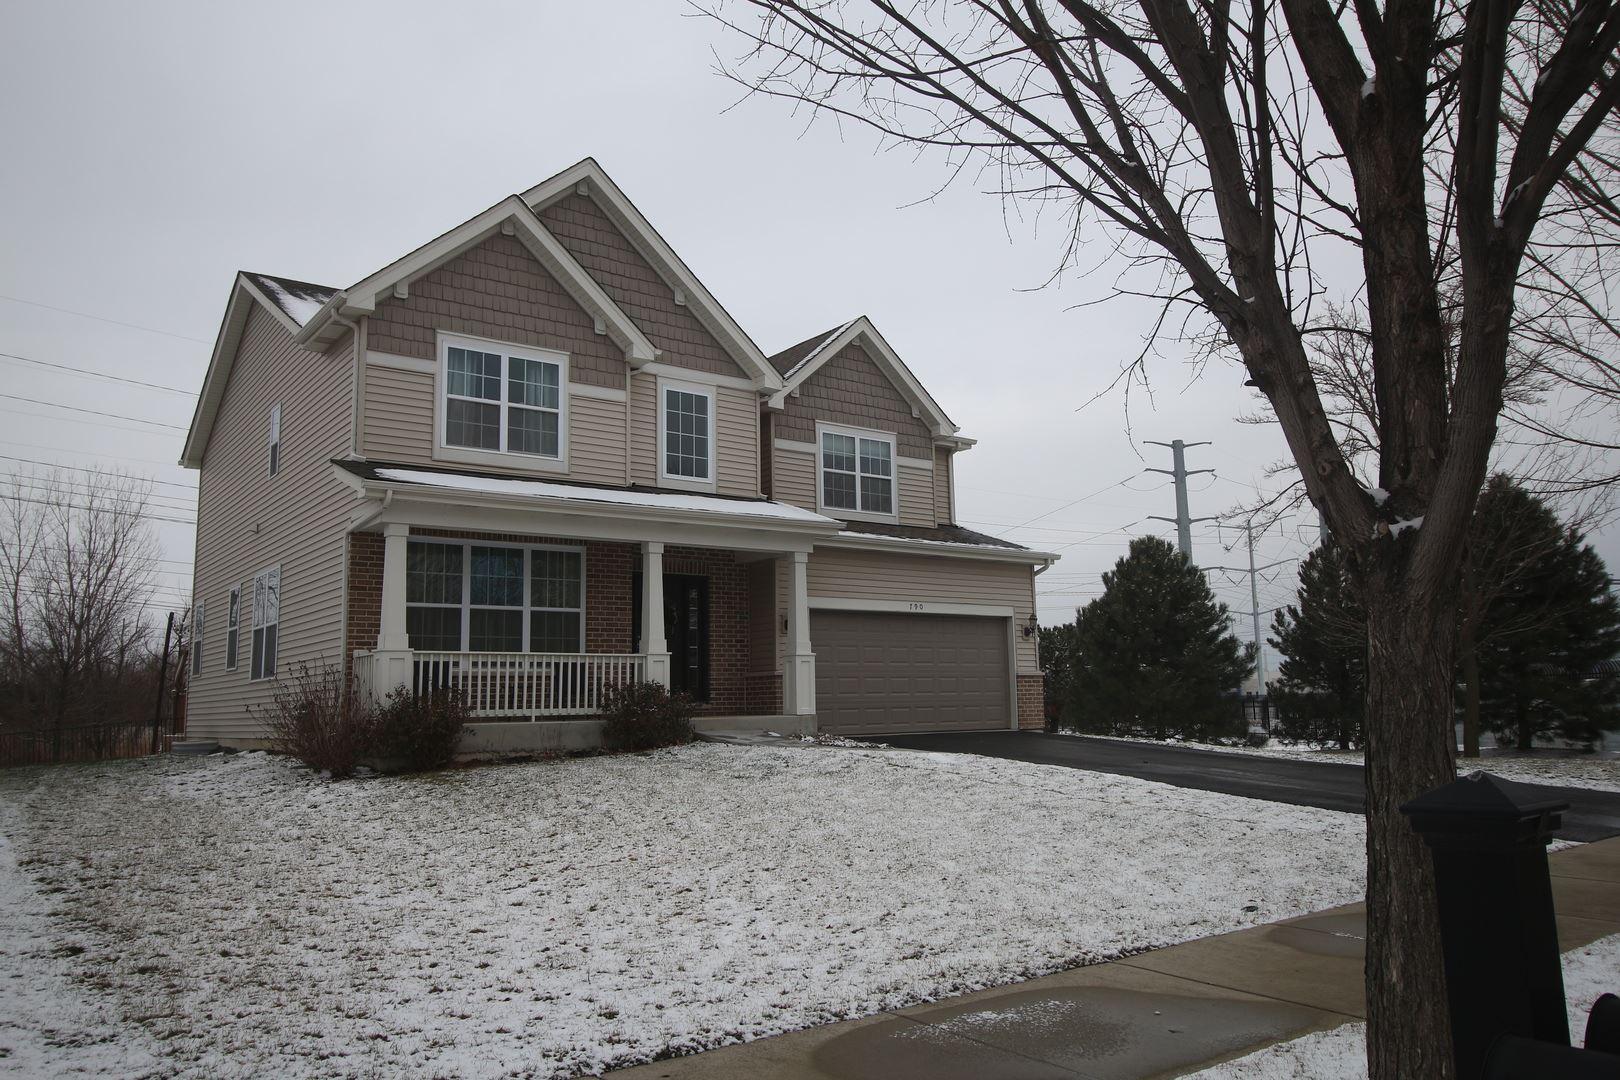 Photo of 790 N Sleepy Hollow Lane, Romeoville, IL 60446 (MLS # 10987803)